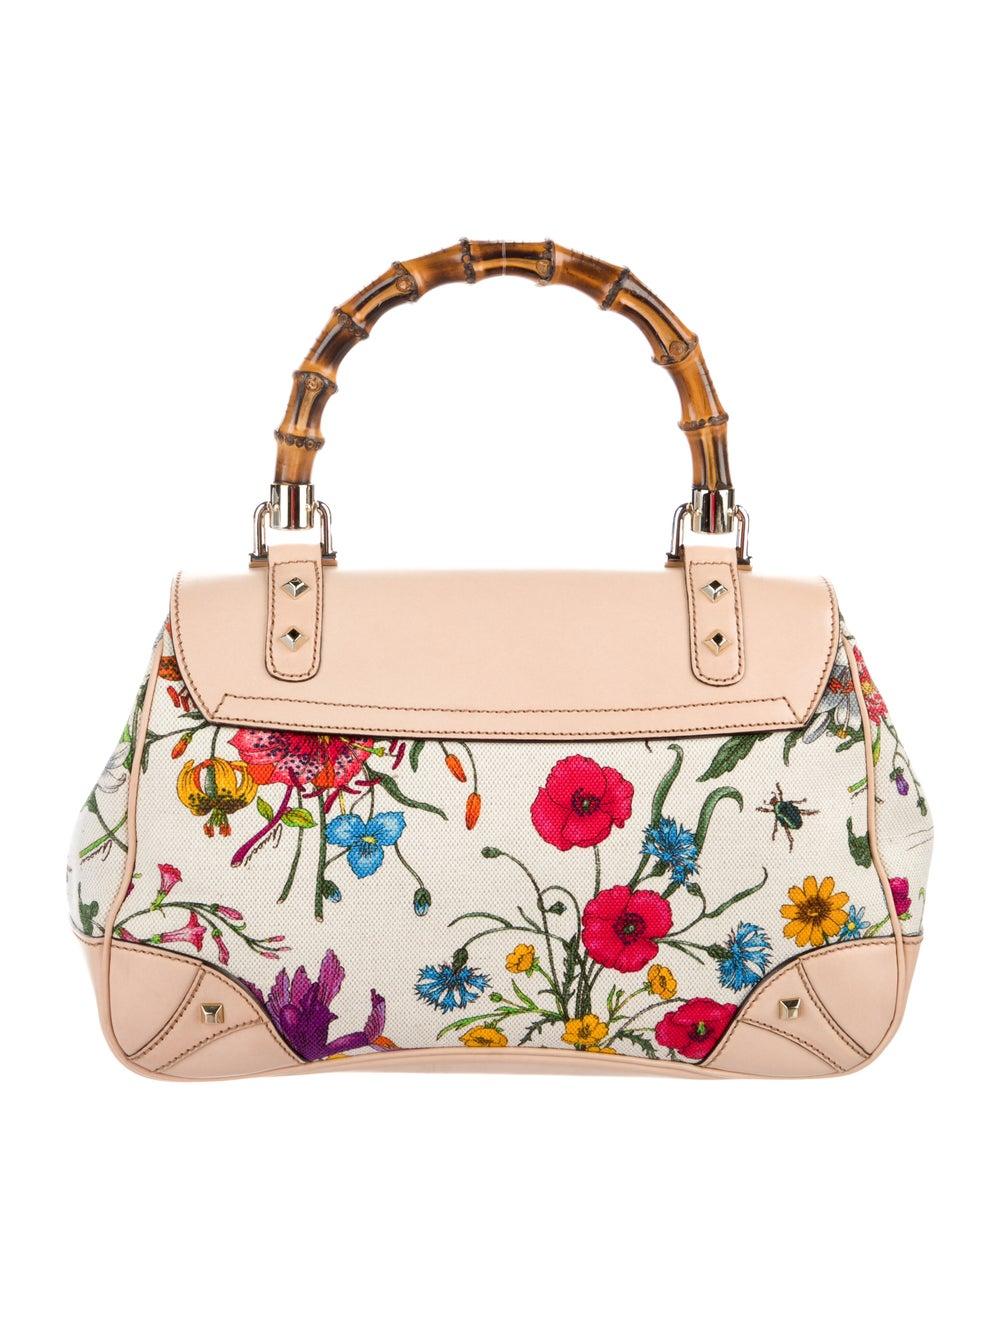 Gucci Flora Bamboo Handle Bag White - image 4